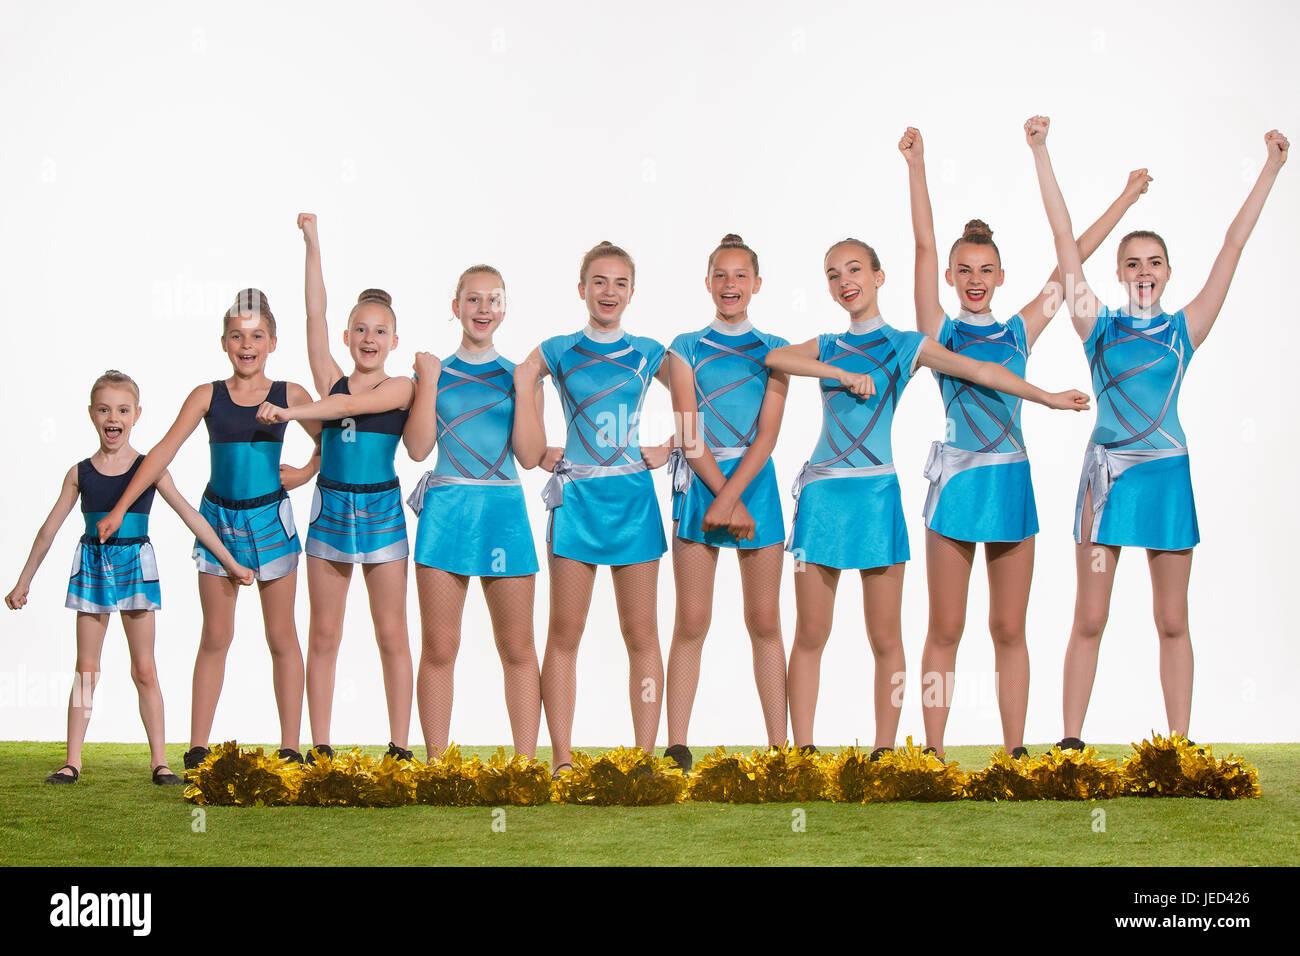 Will change Teen cheer girl group pics